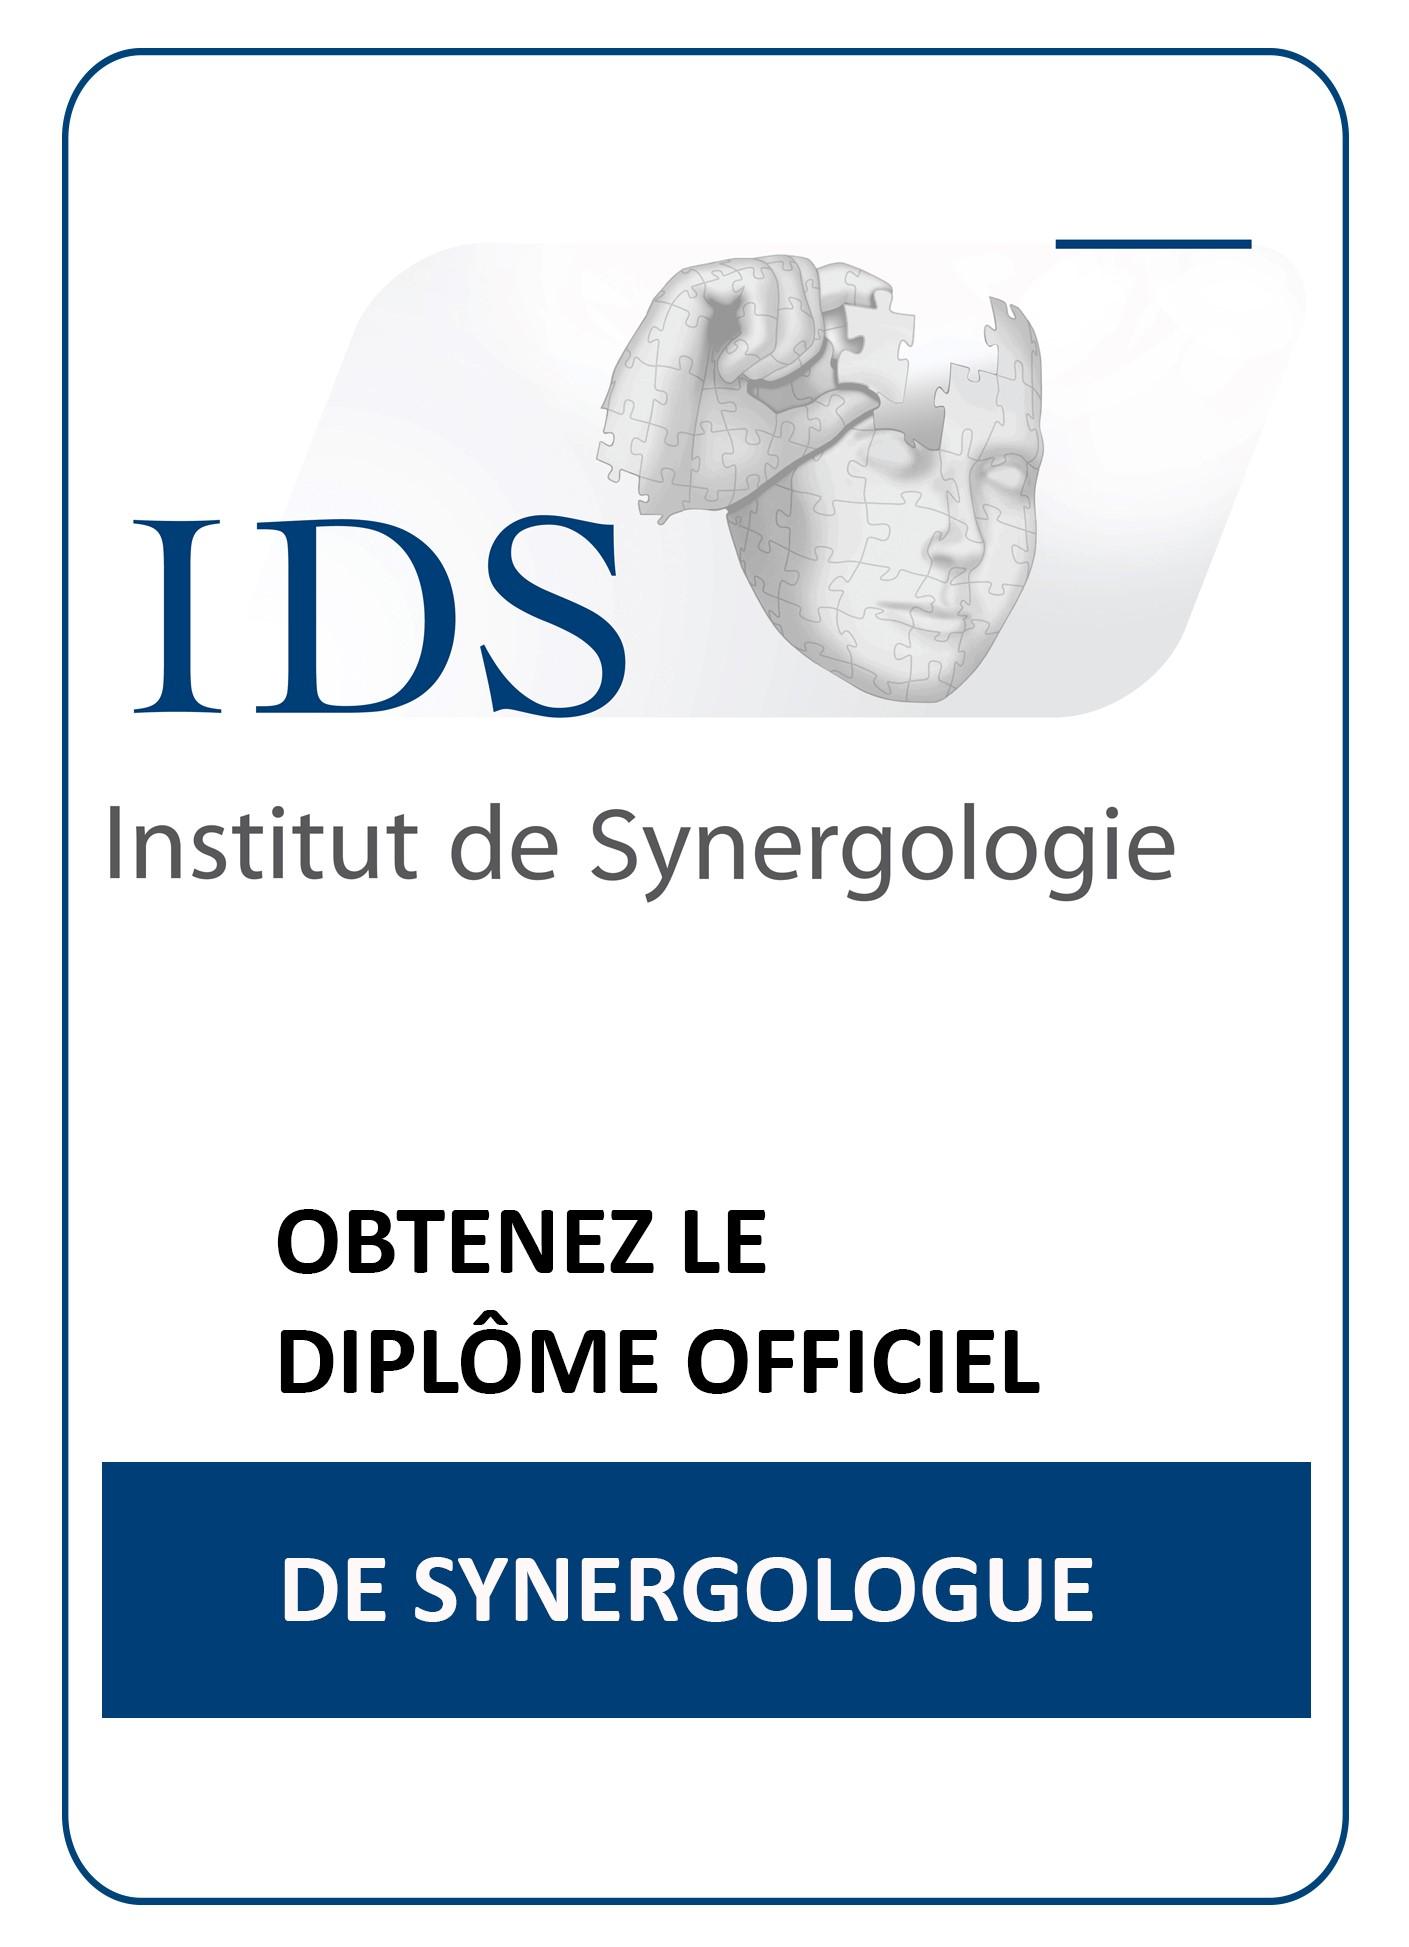 Institut de synergologie (IDS)